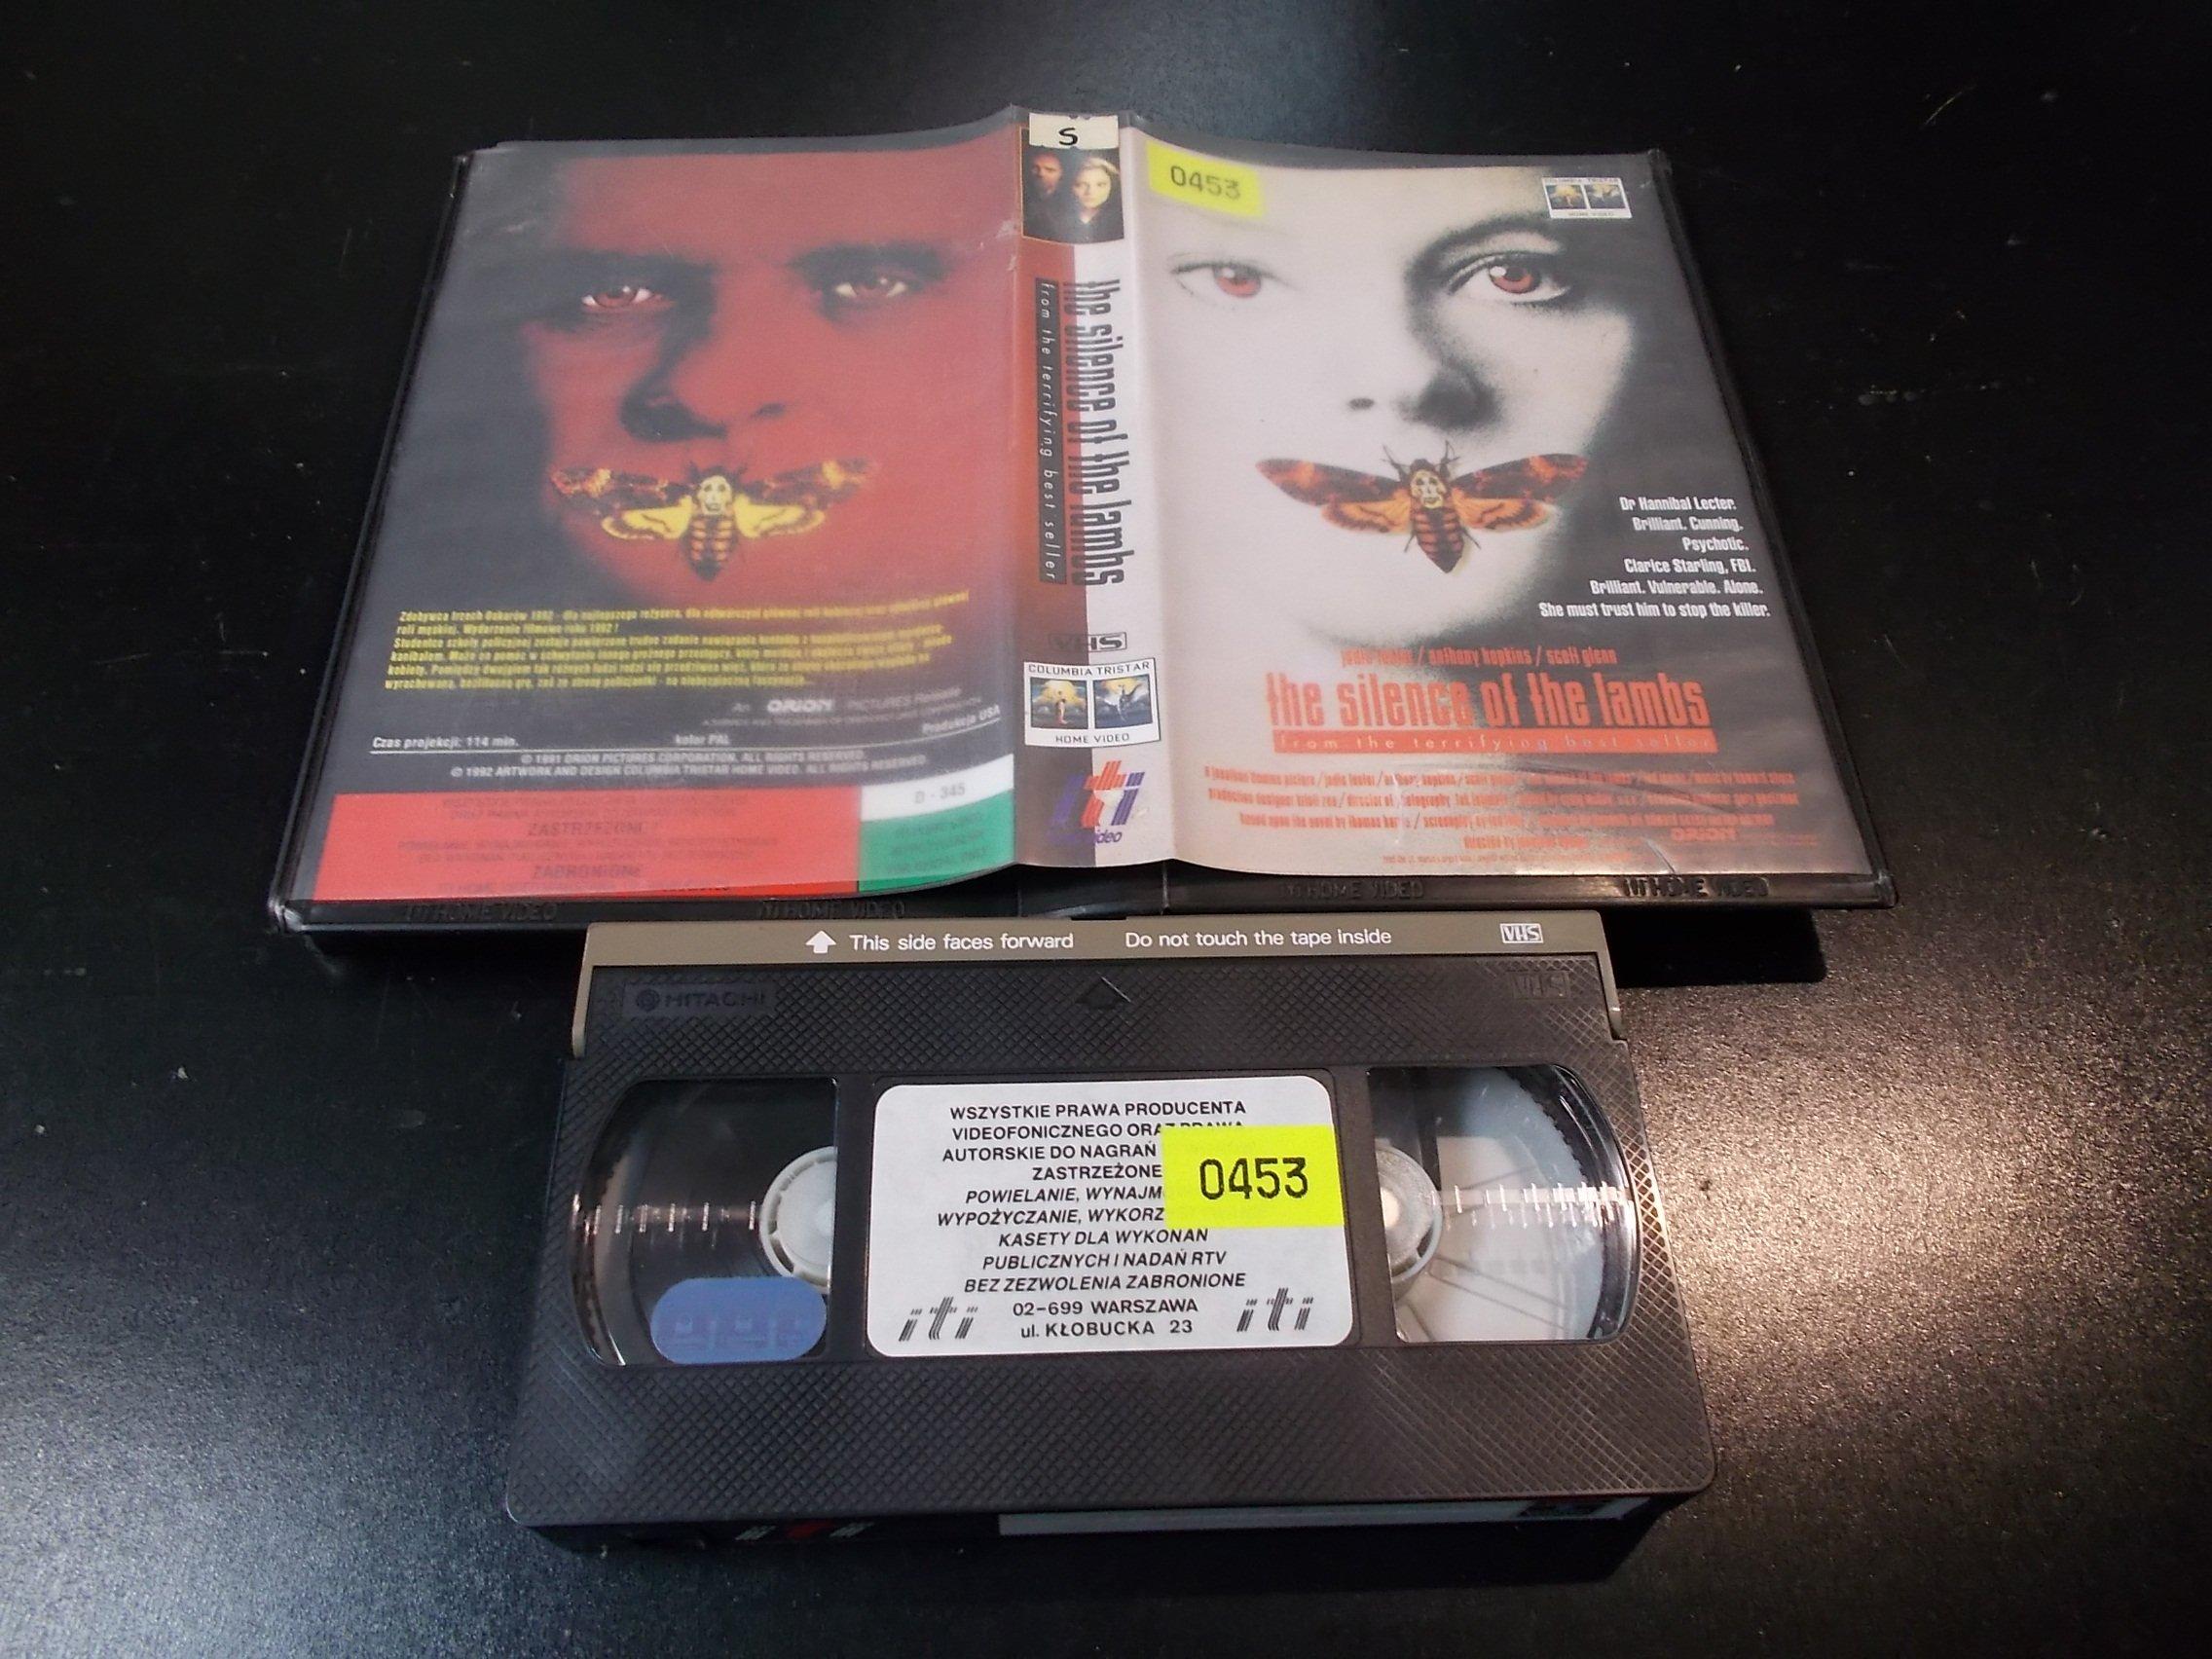 MILCZENIE OWIEC - ANTHONY HOPKINS - kaseta Video VHS - 1374 Sklep